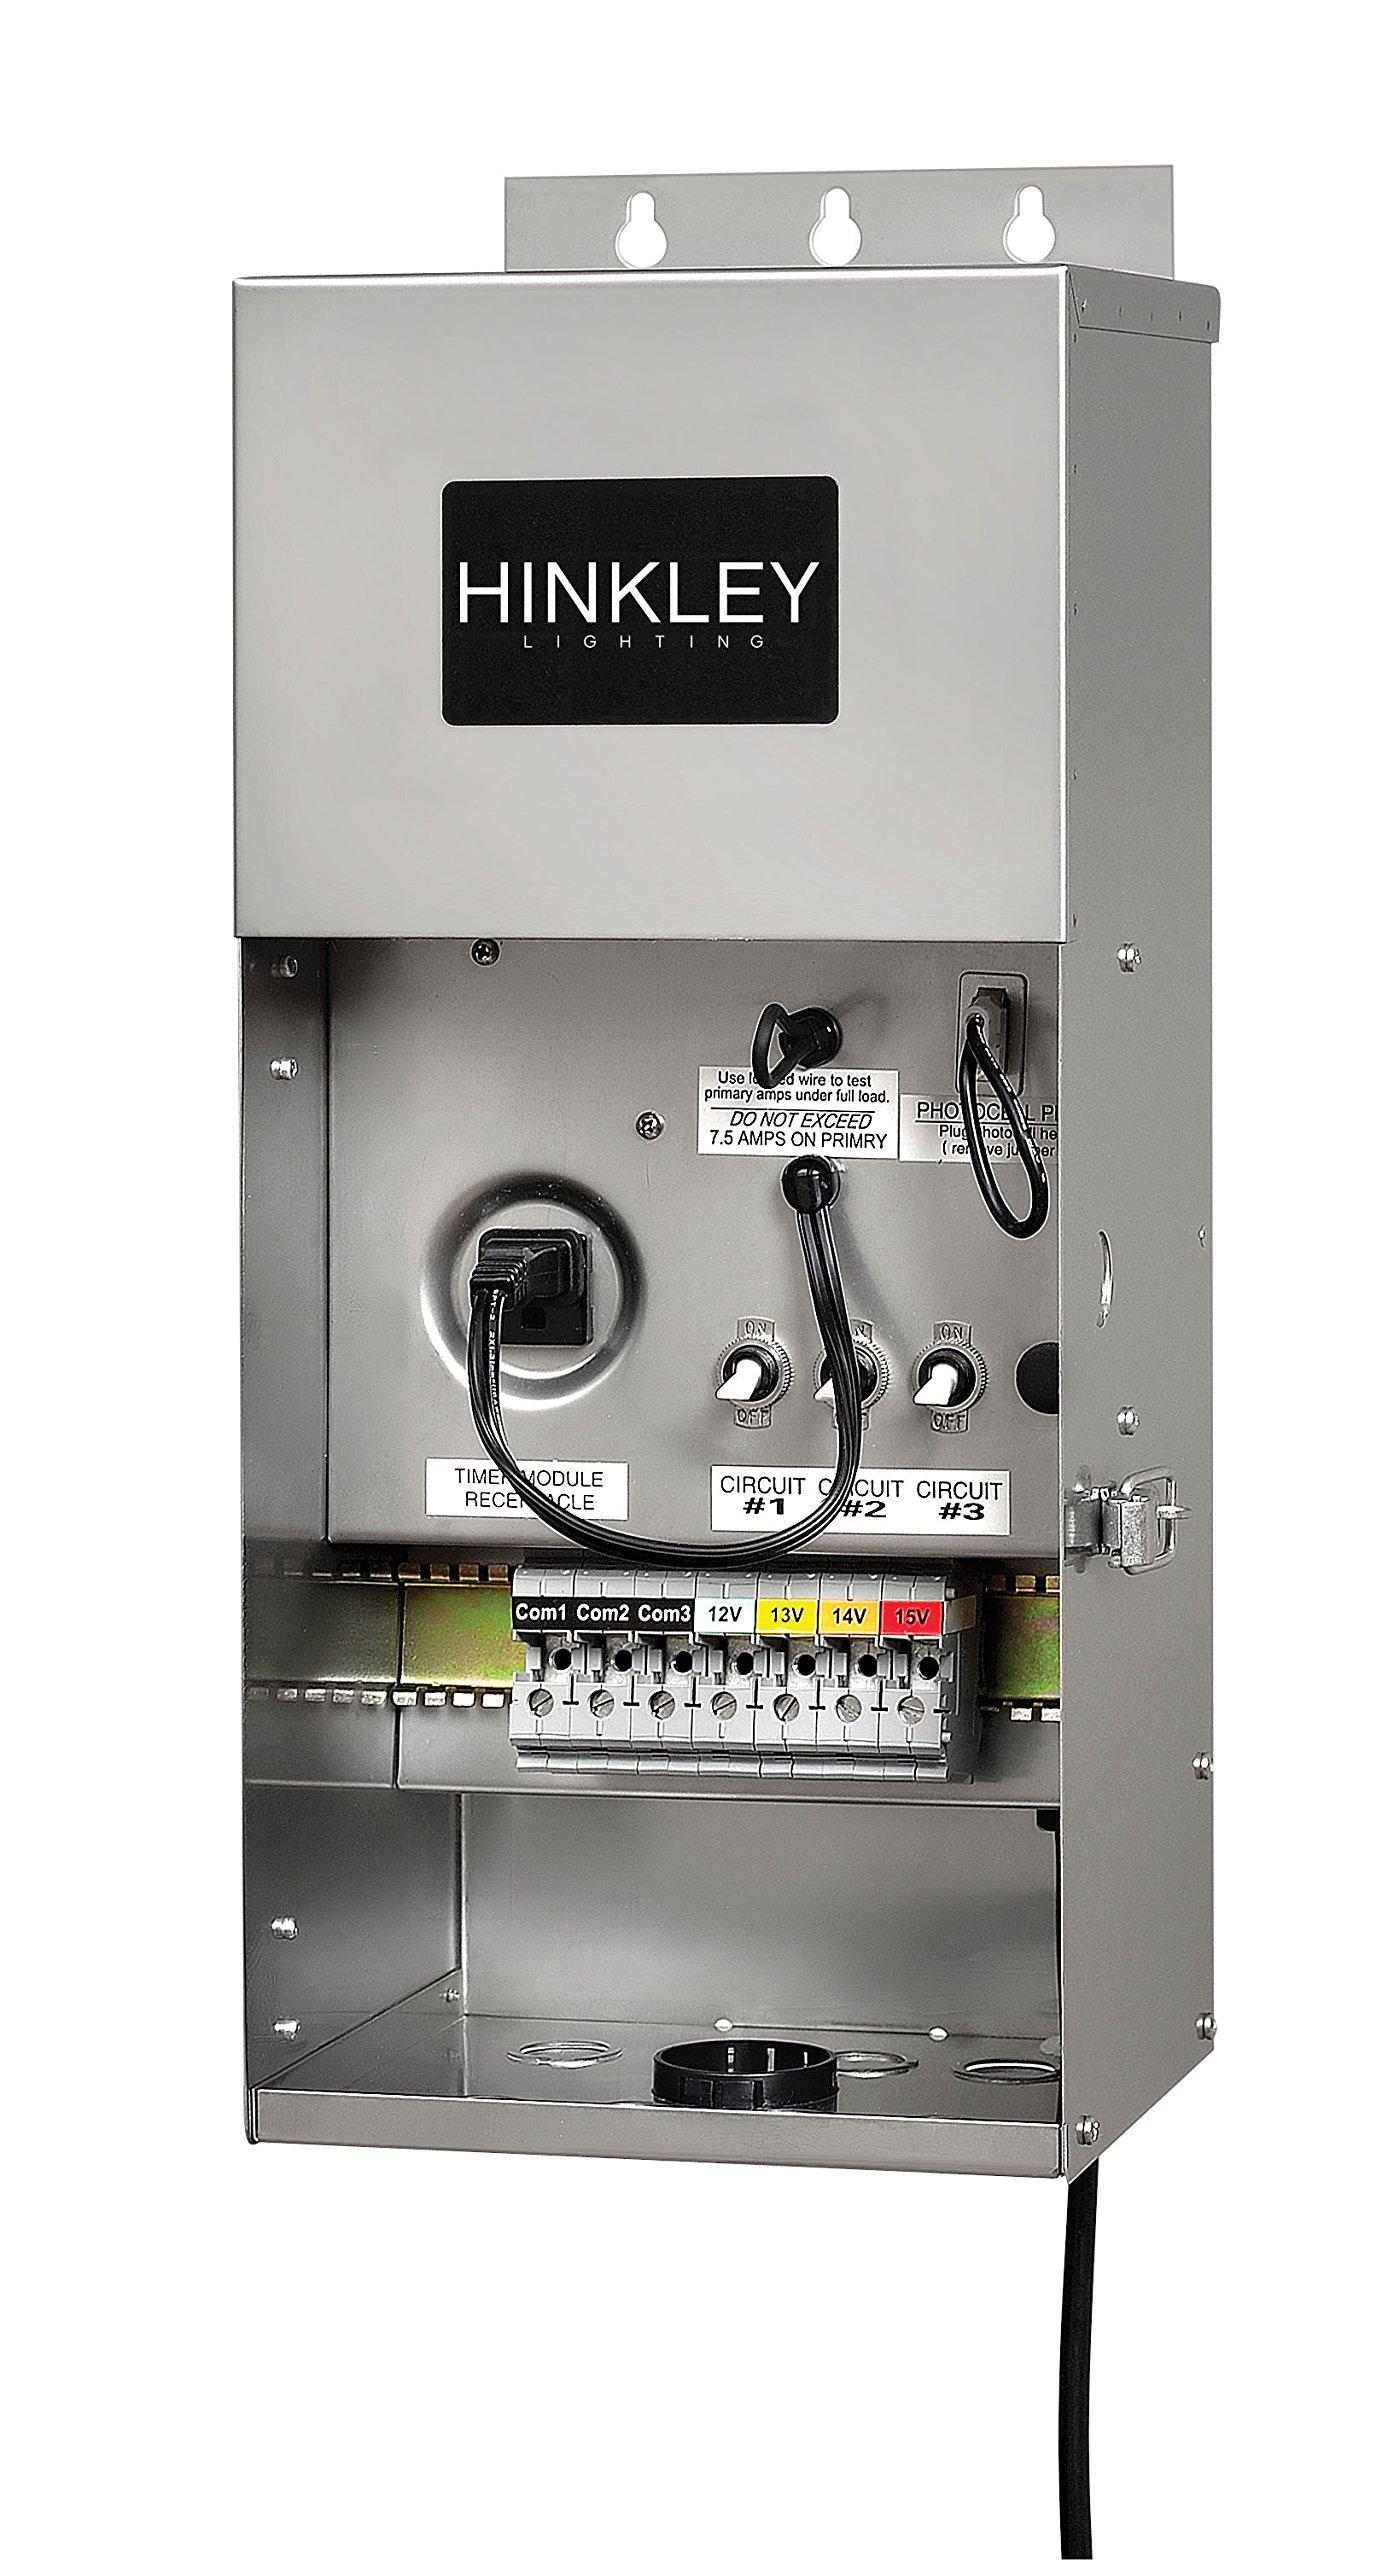 Hinkley Lighting 0900SS Pro Series Multi-Tap 12-15 Volt 900 Watt Transformer, Stainless Steel